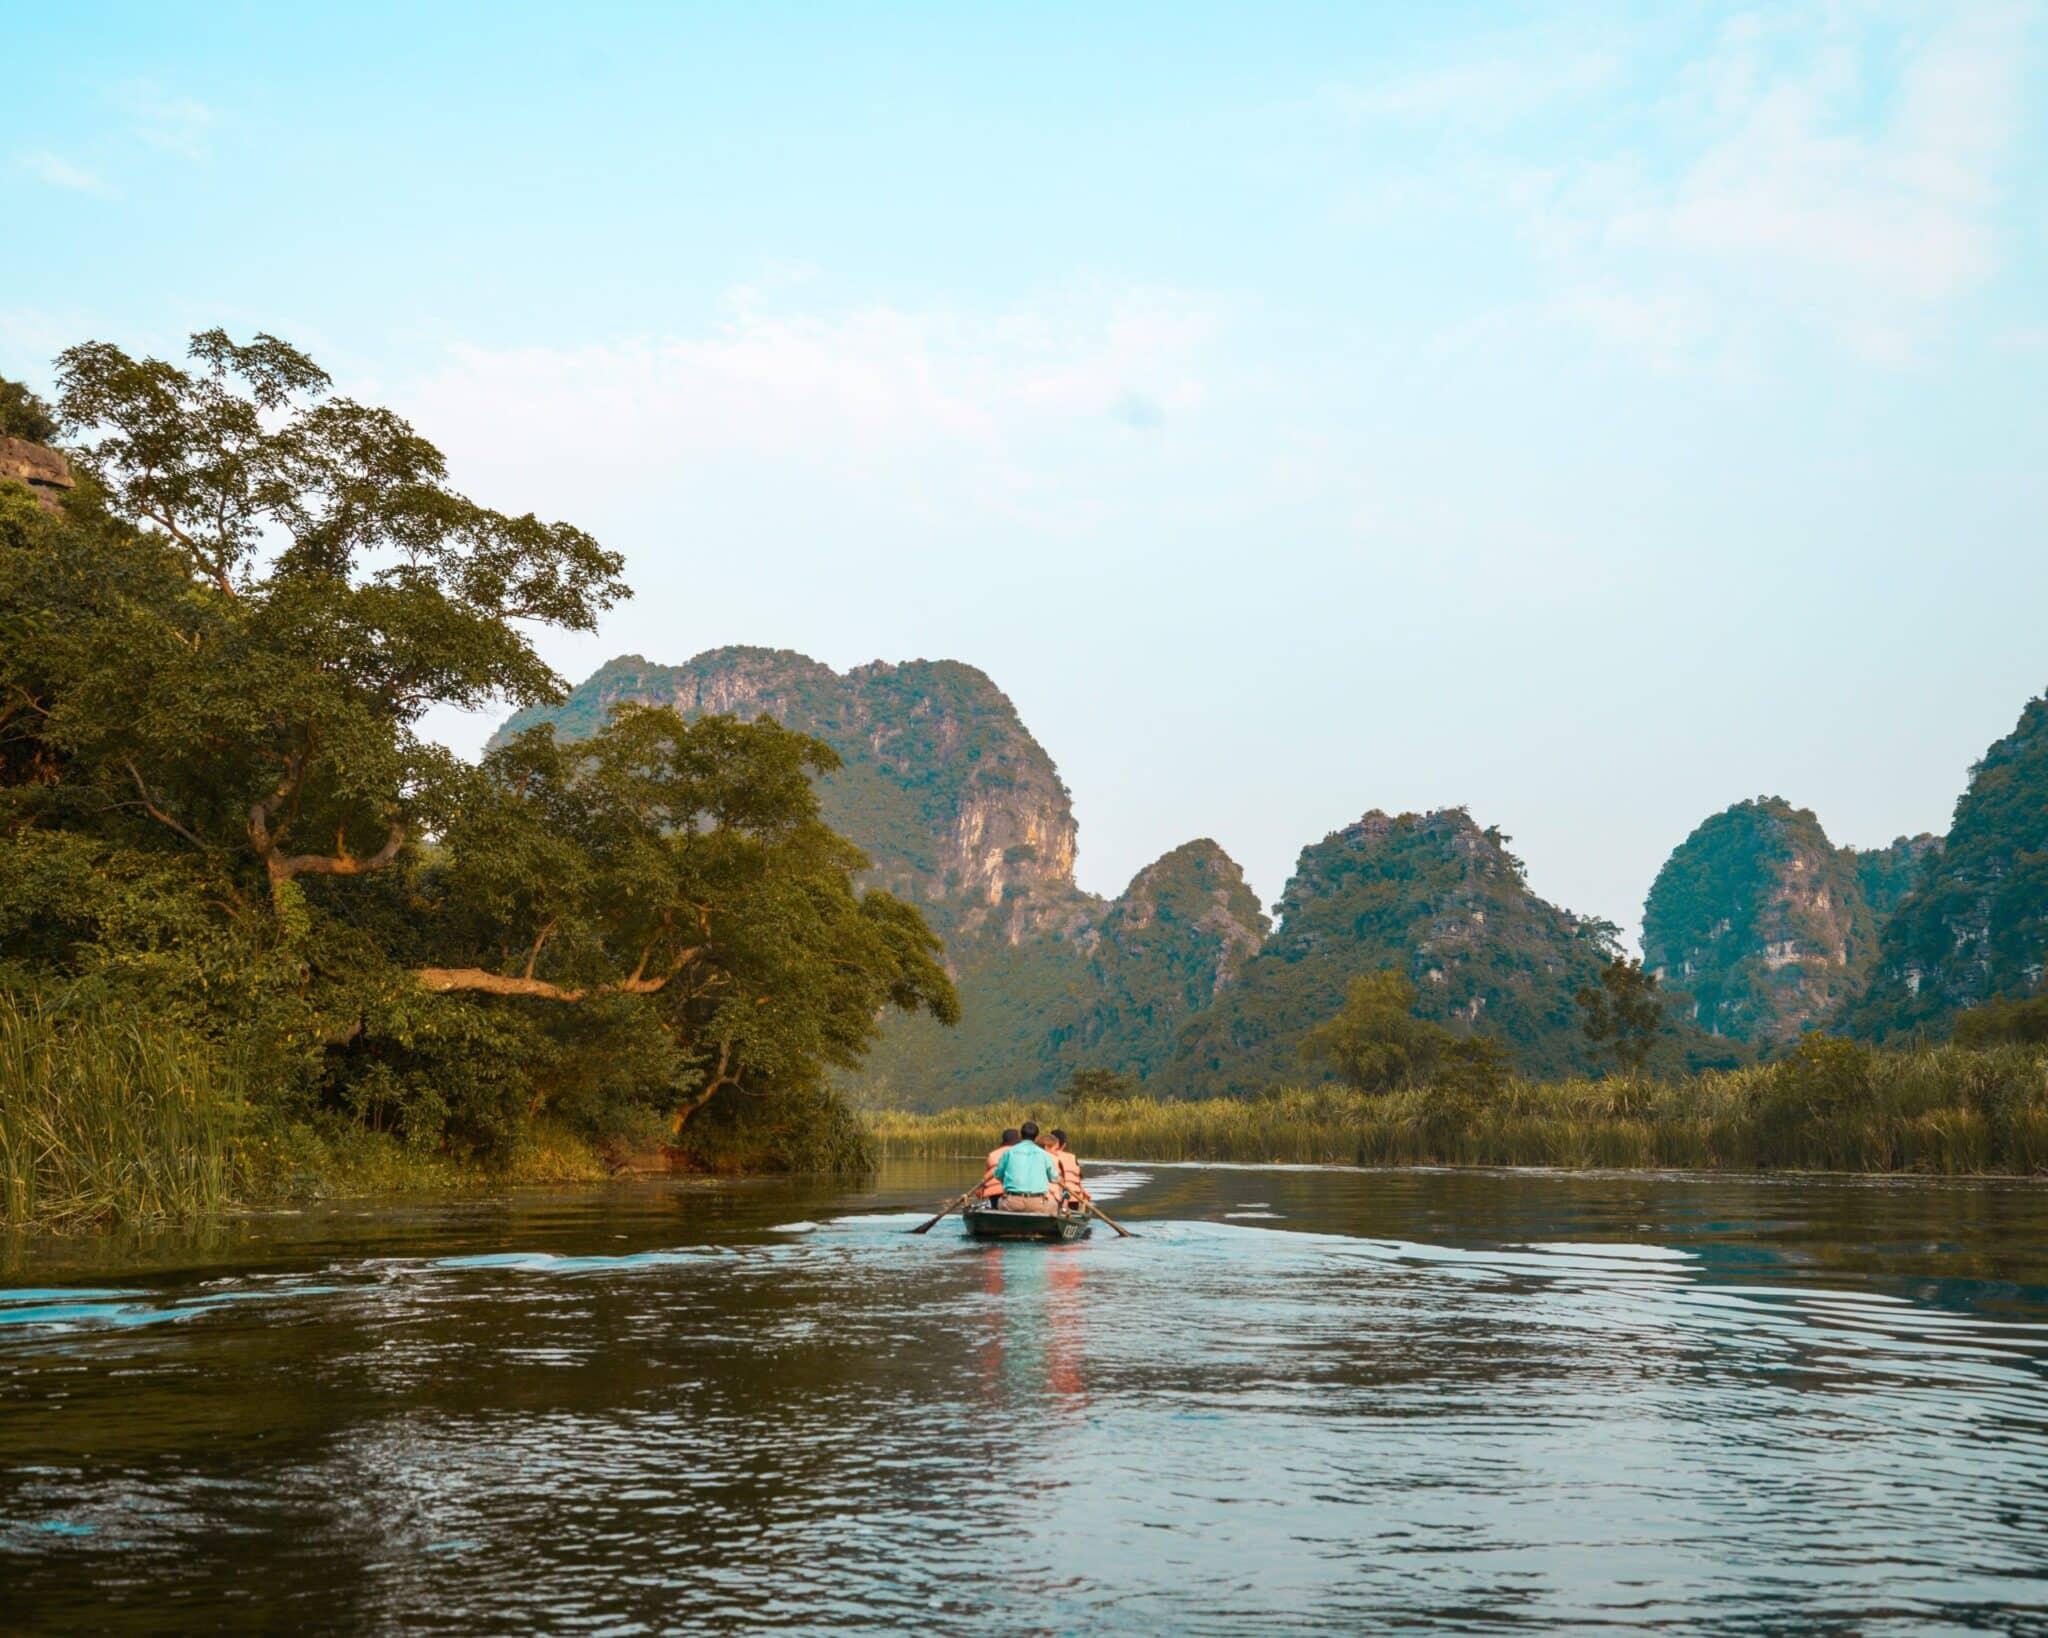 Explore Vietnam by boat; boat rowing through limestone formatinos